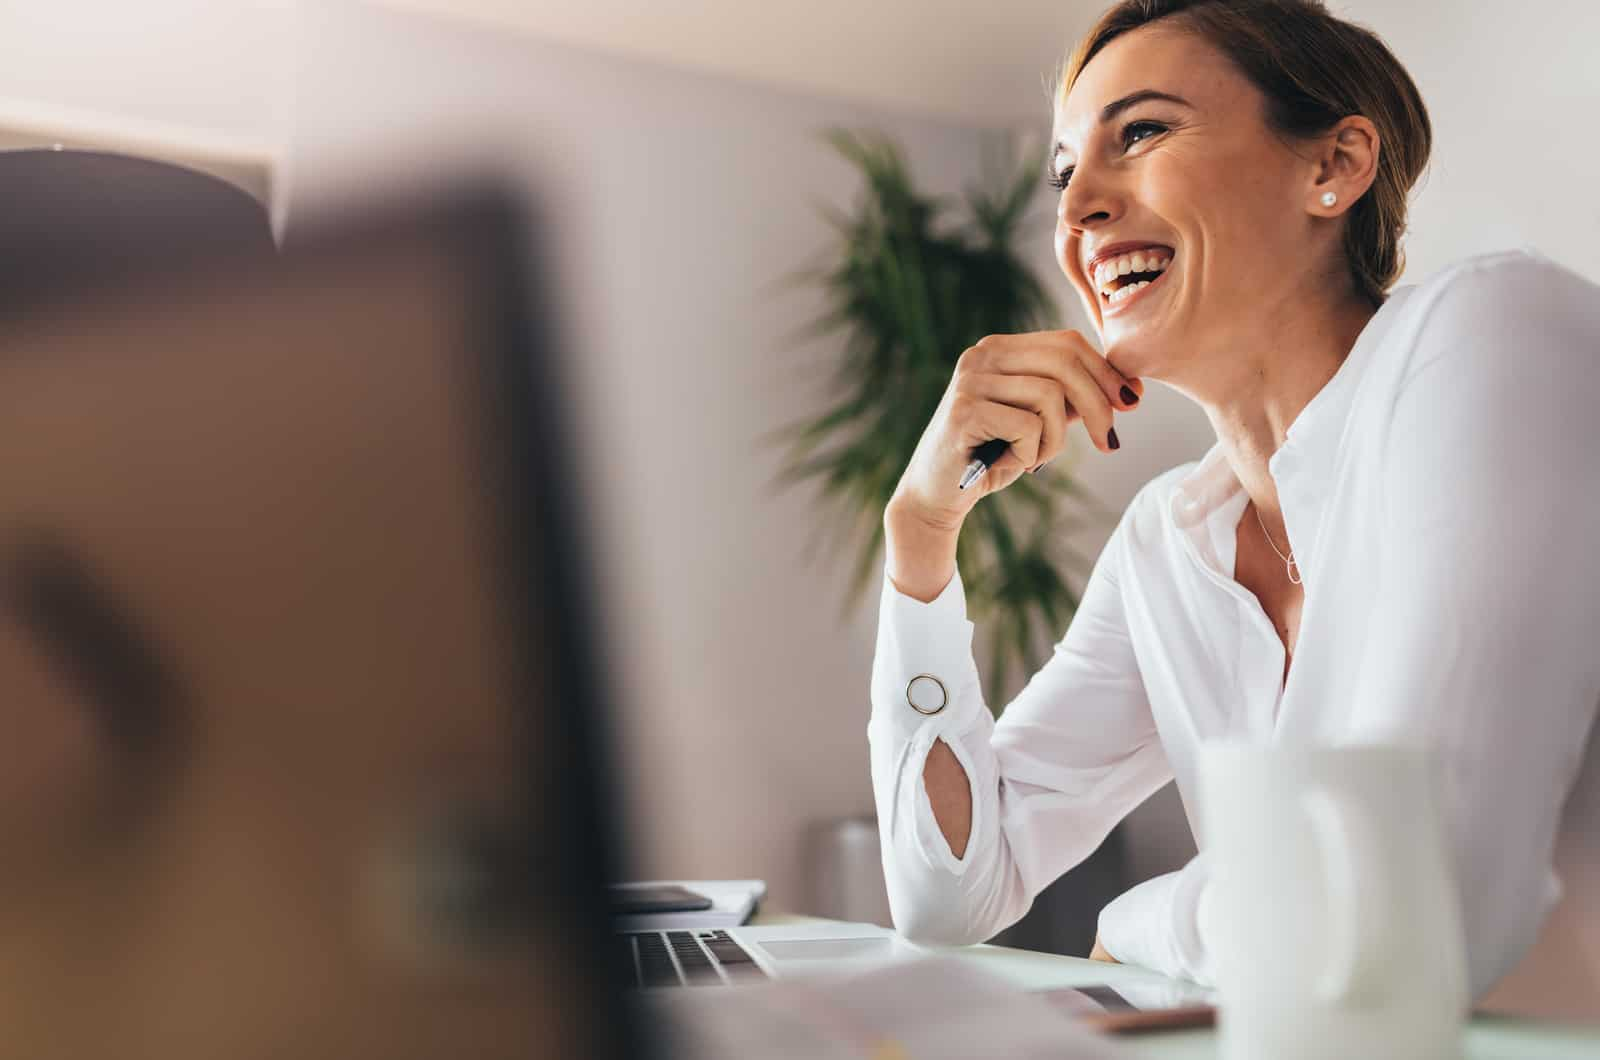 Frau am Schreibtisch lächelt